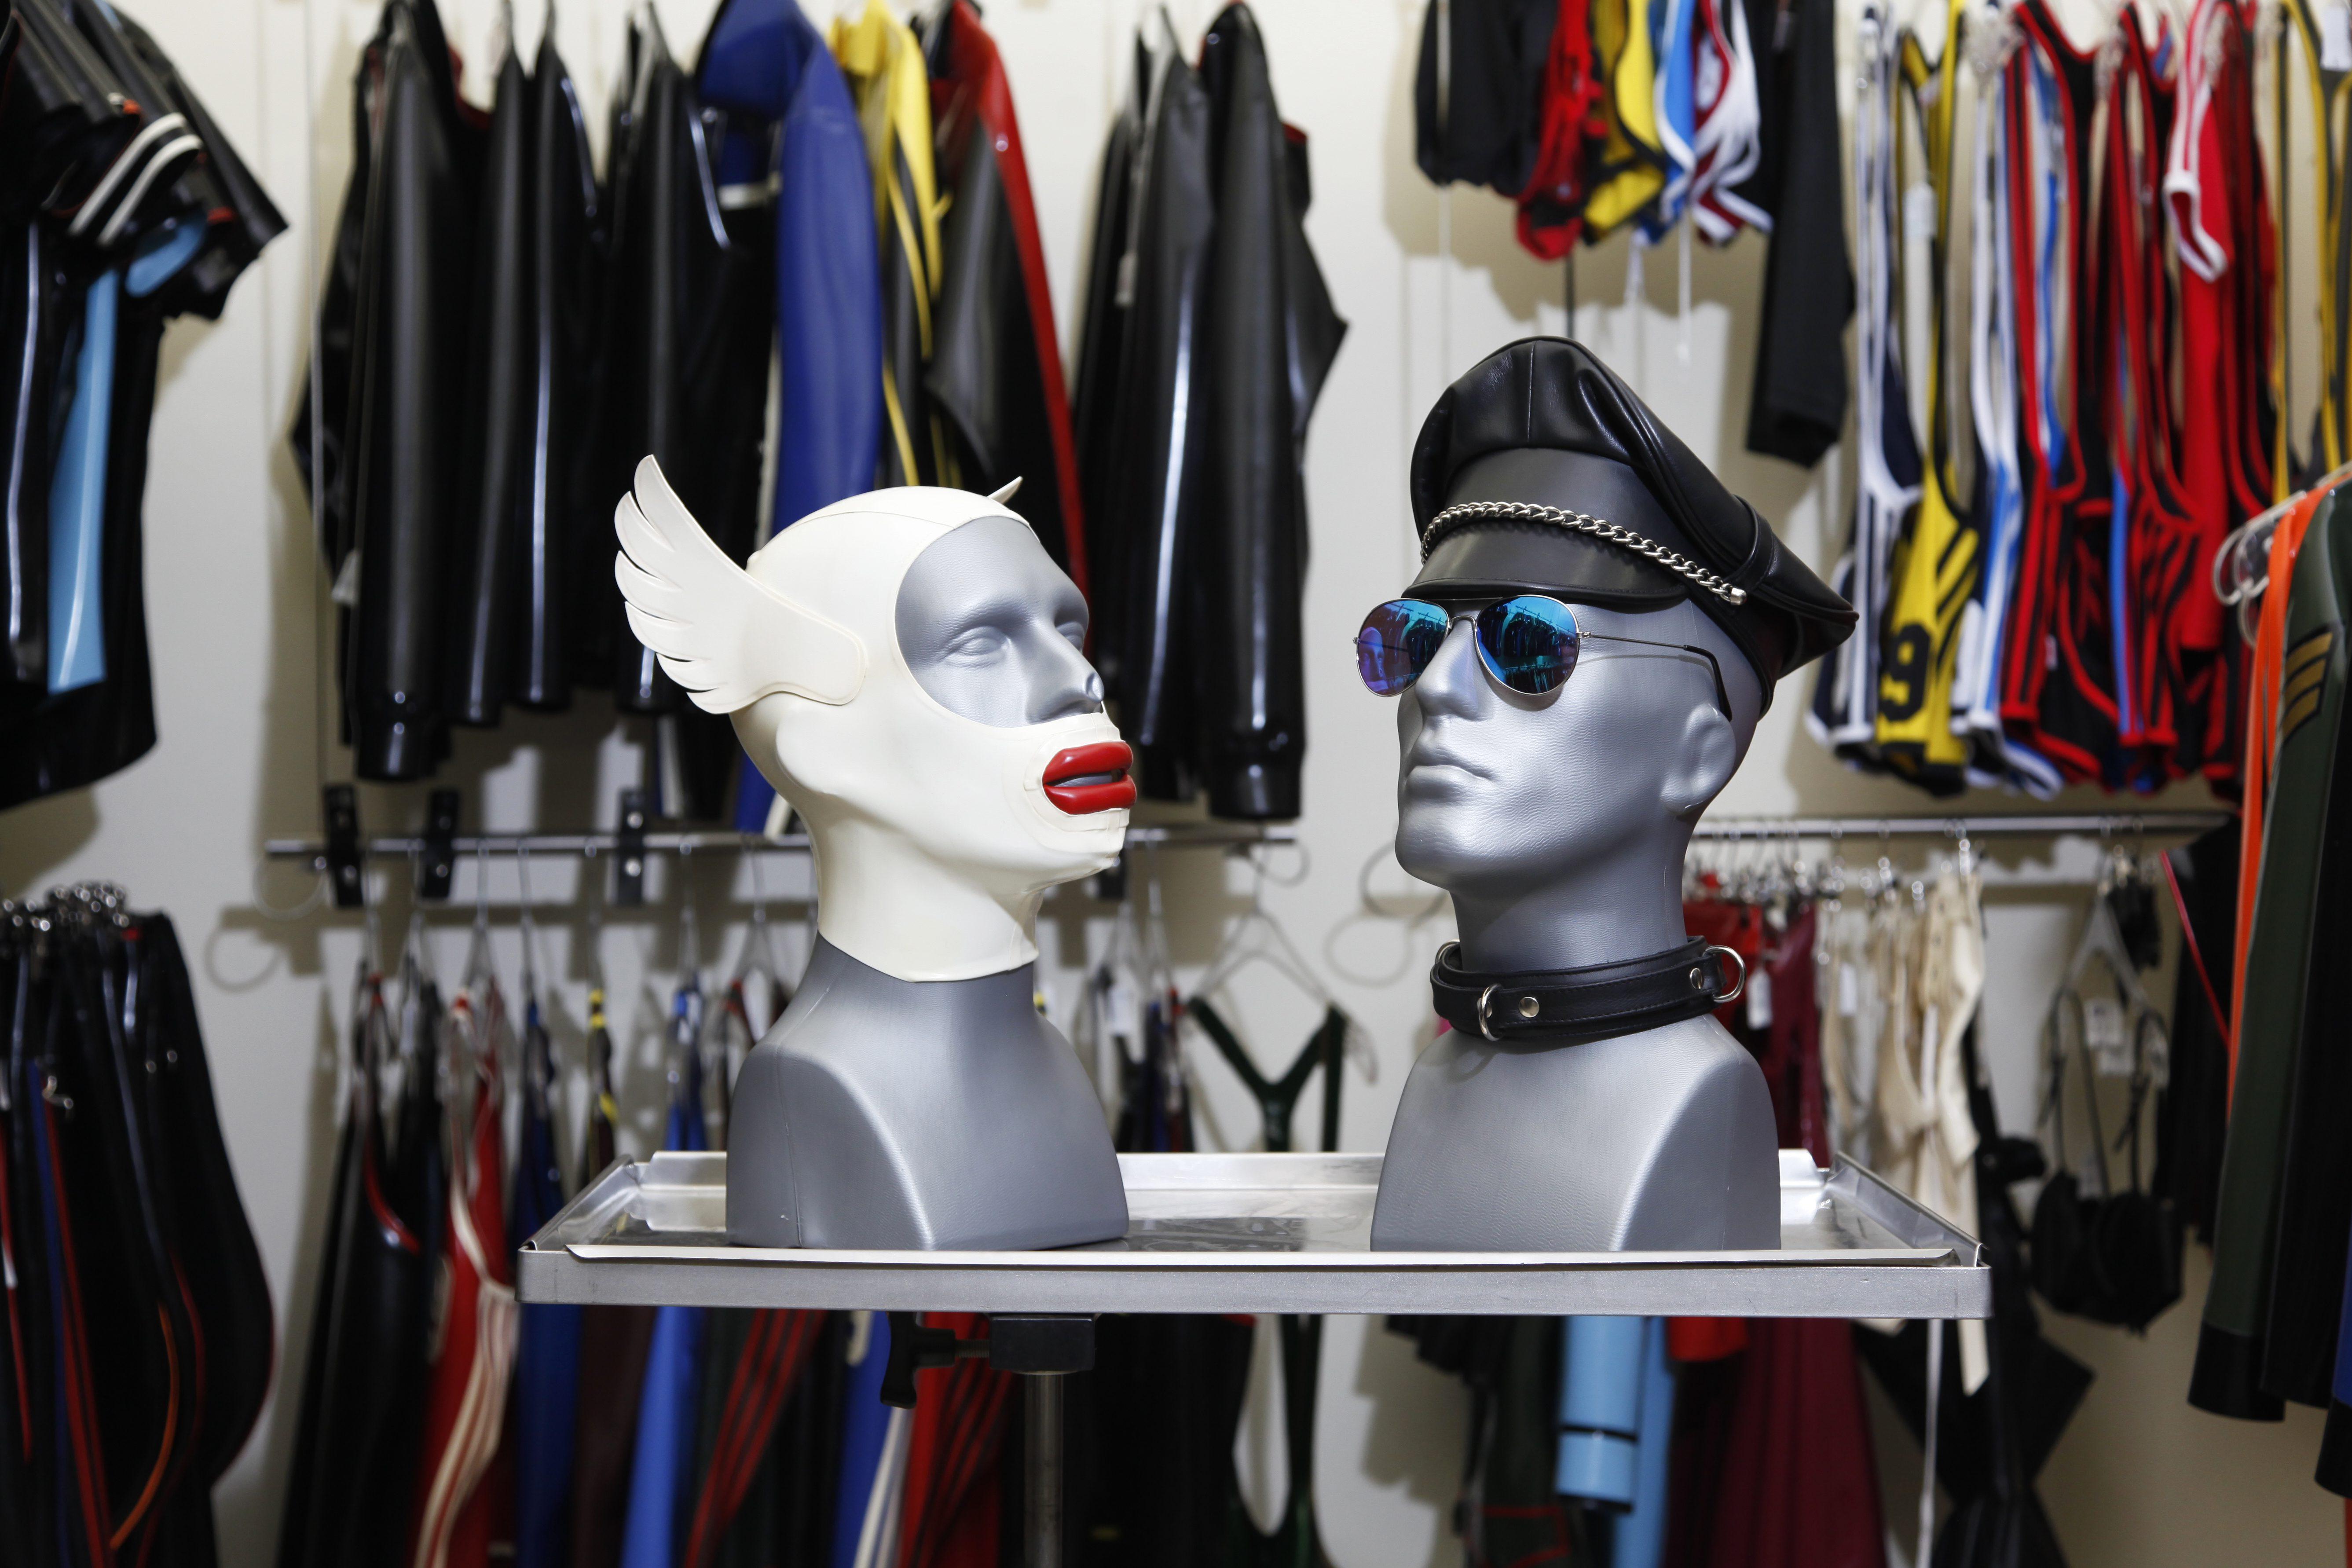 Masks at Butcherei Lindinger